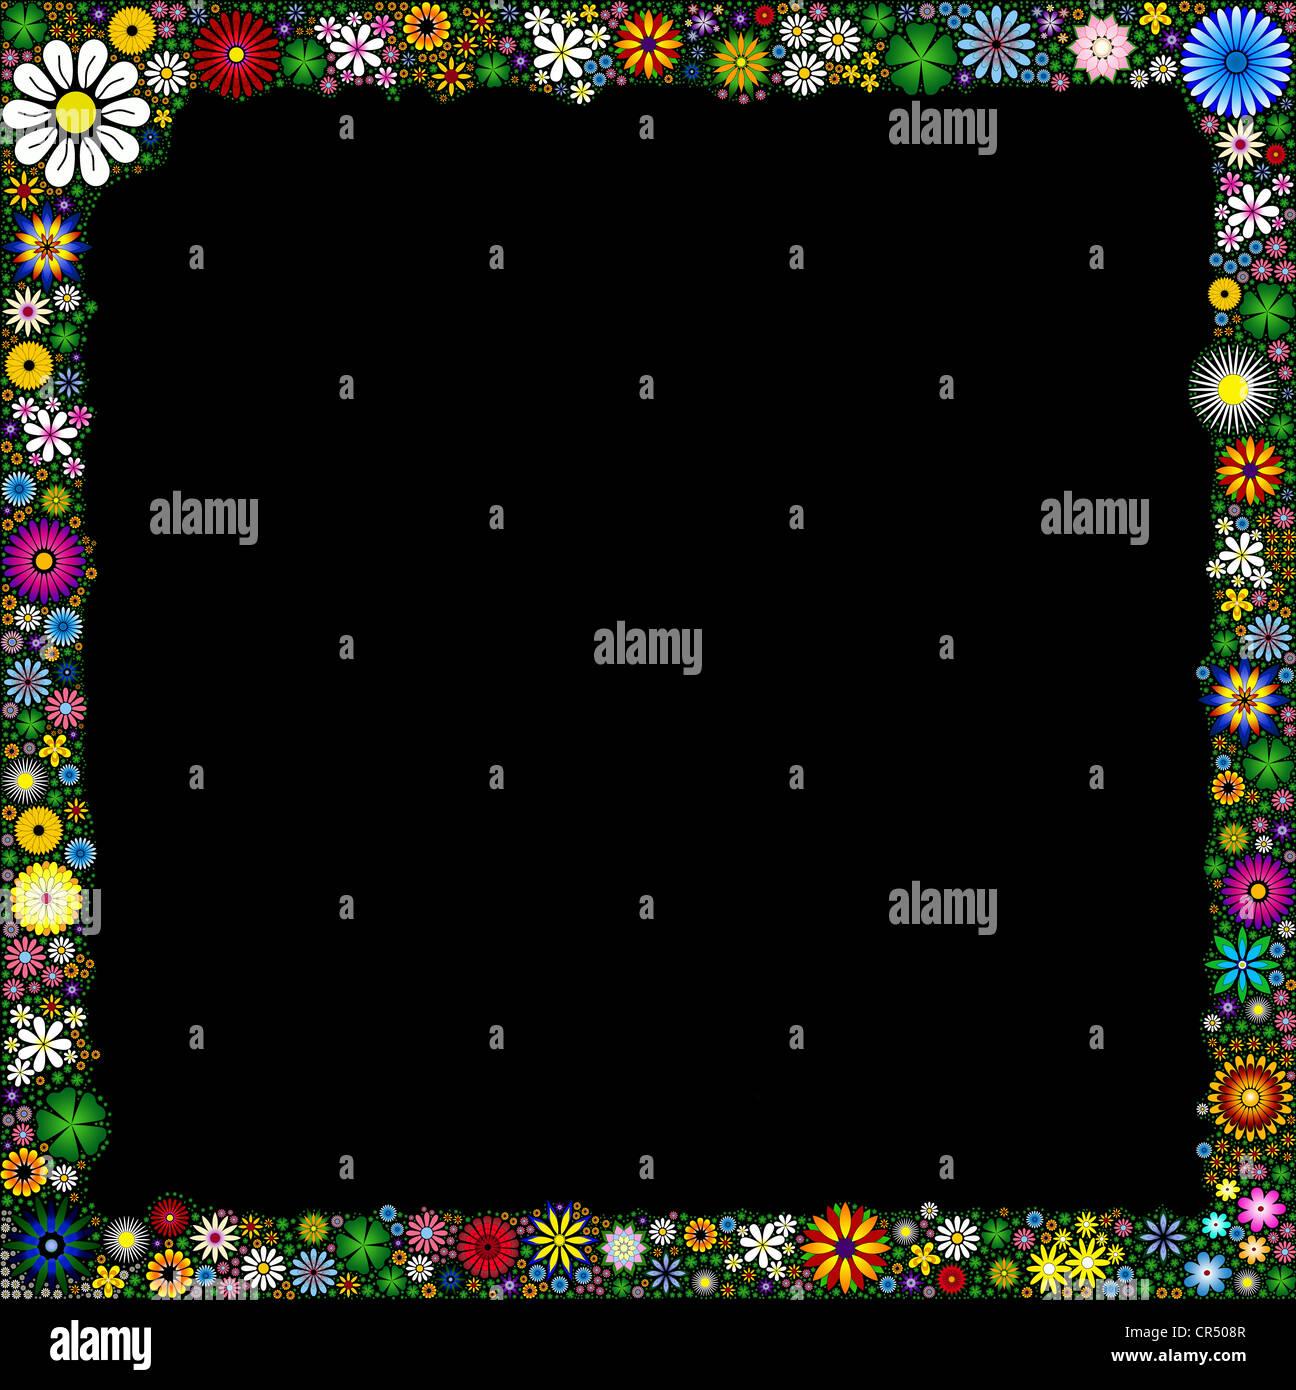 Flower frame / border on black background - Stock Image